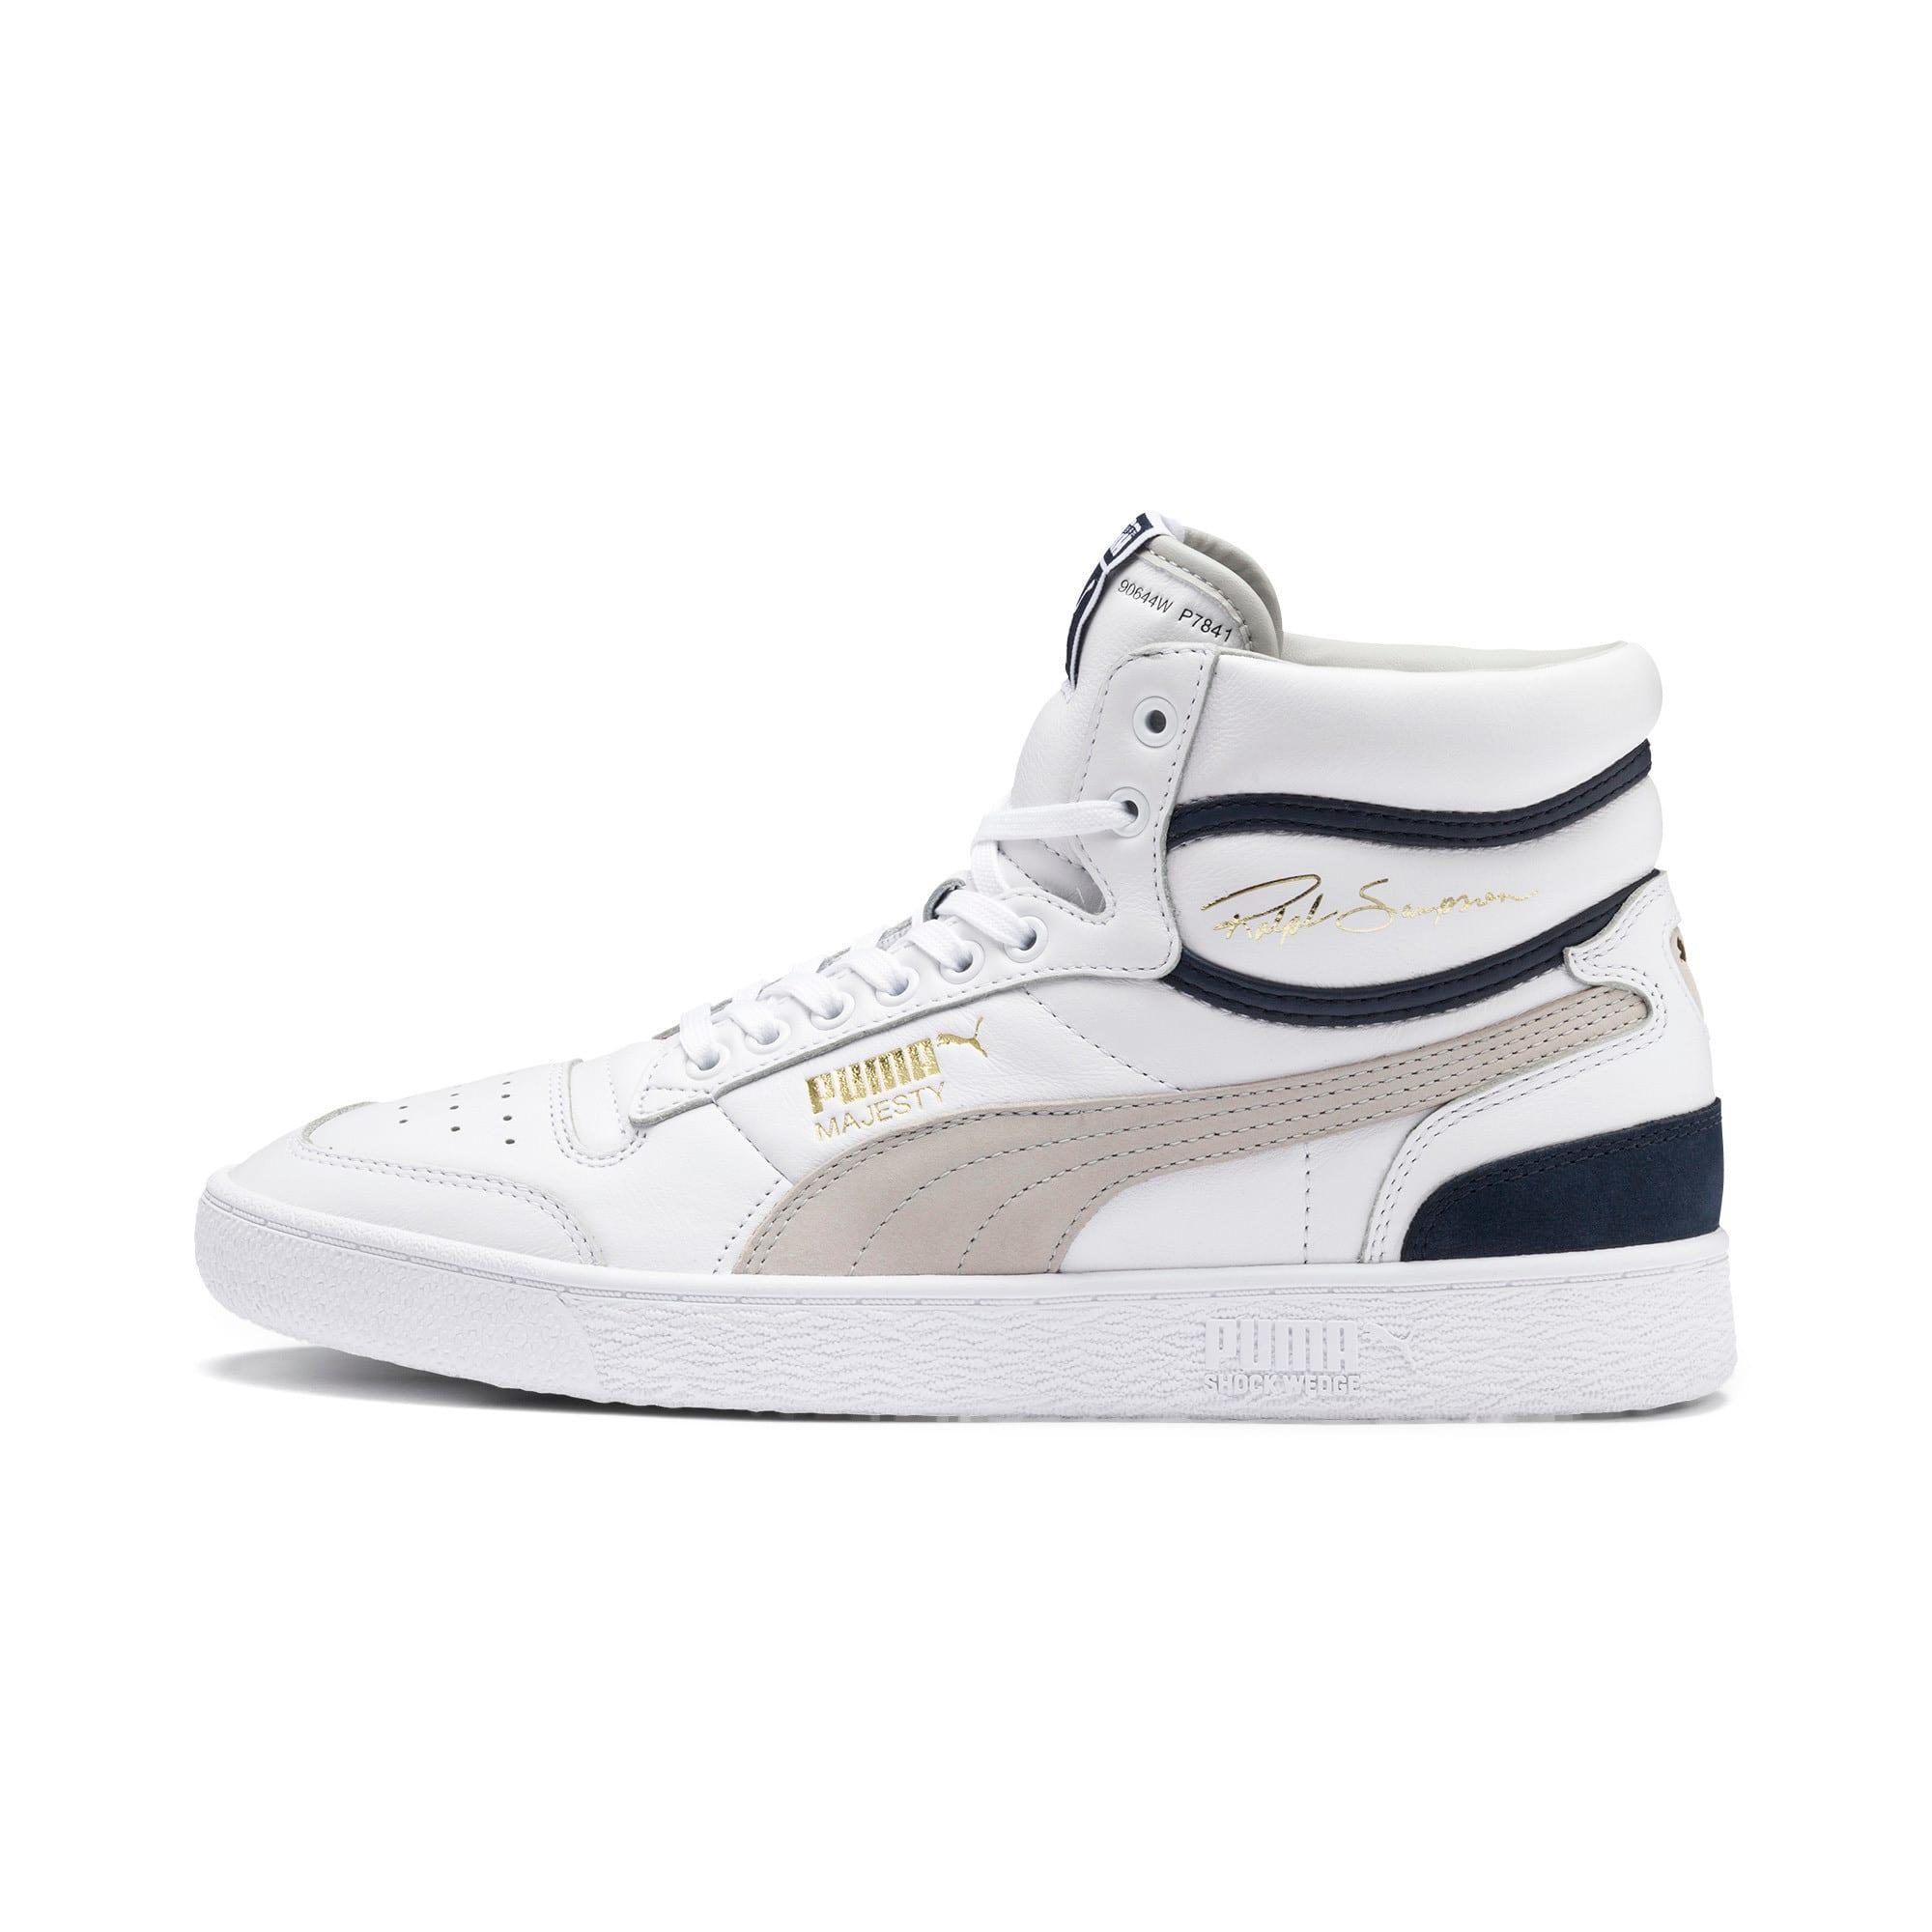 Miniatura 1 de Zapatos deportivos de caña media Ralph Sampson OG, Puma Wht-Gray Violet-Peacoat, mediano